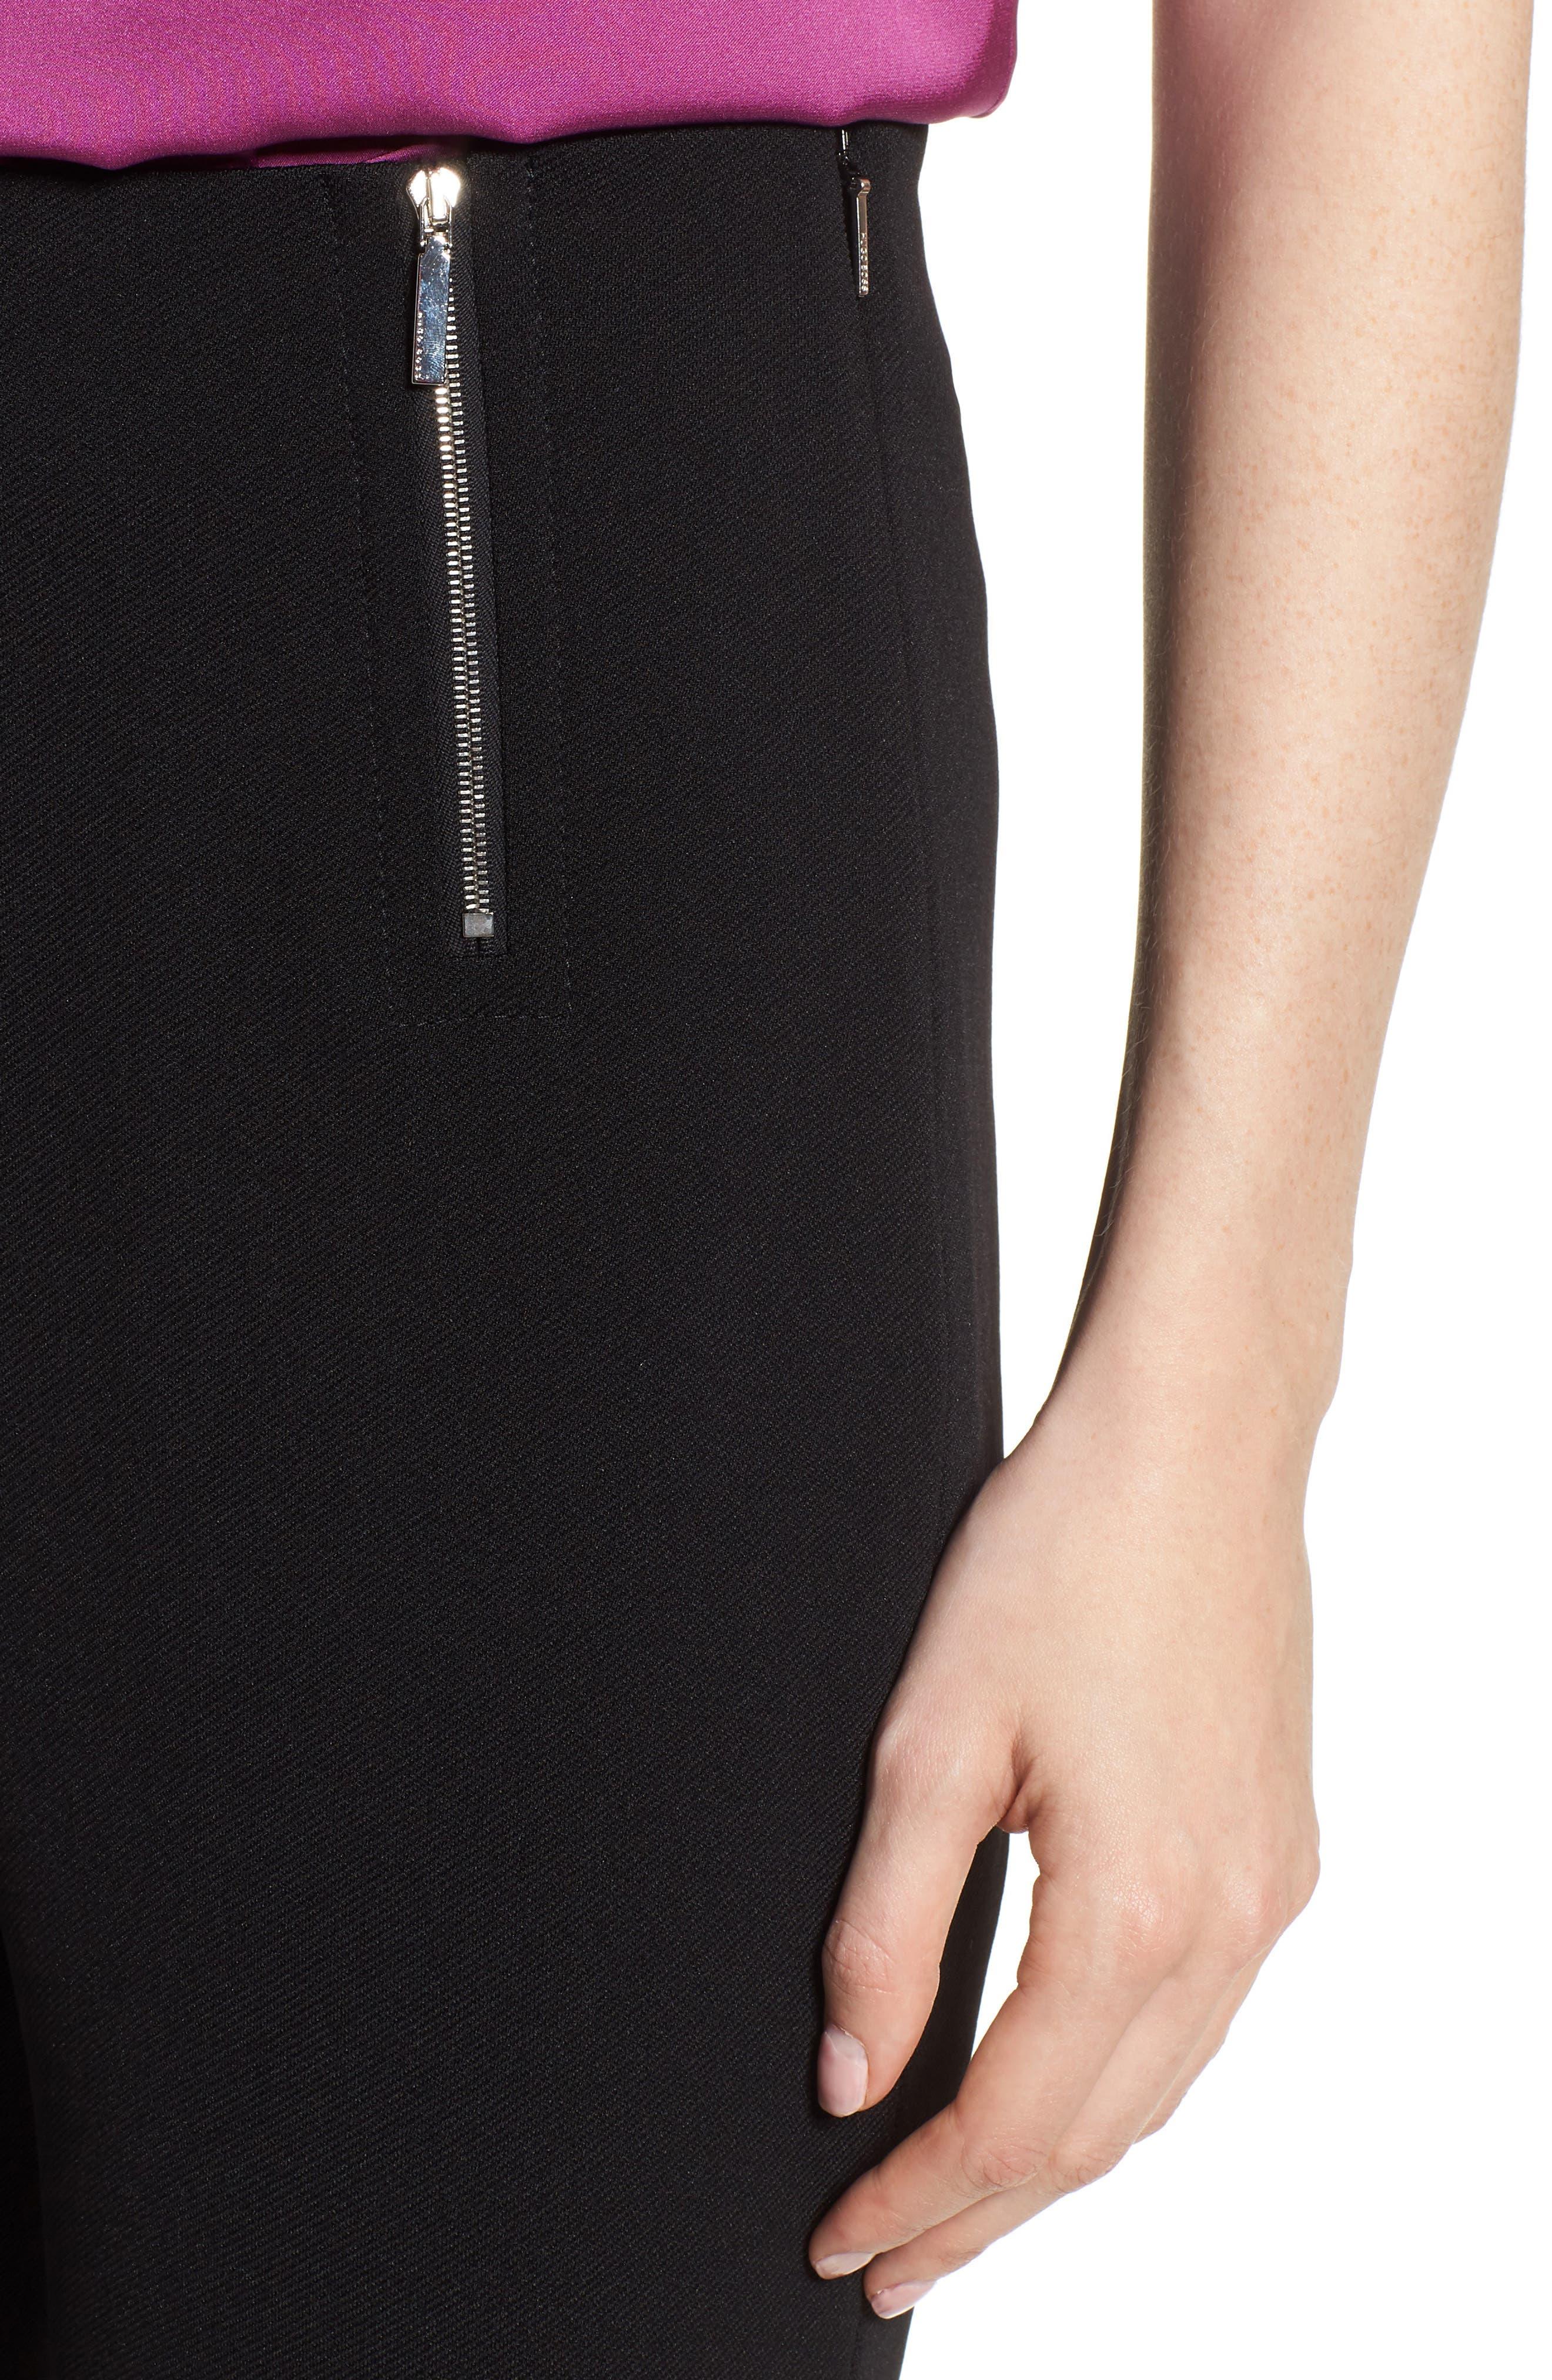 Tilezea Twill Jersey Trousers,                             Alternate thumbnail 4, color,                             Black